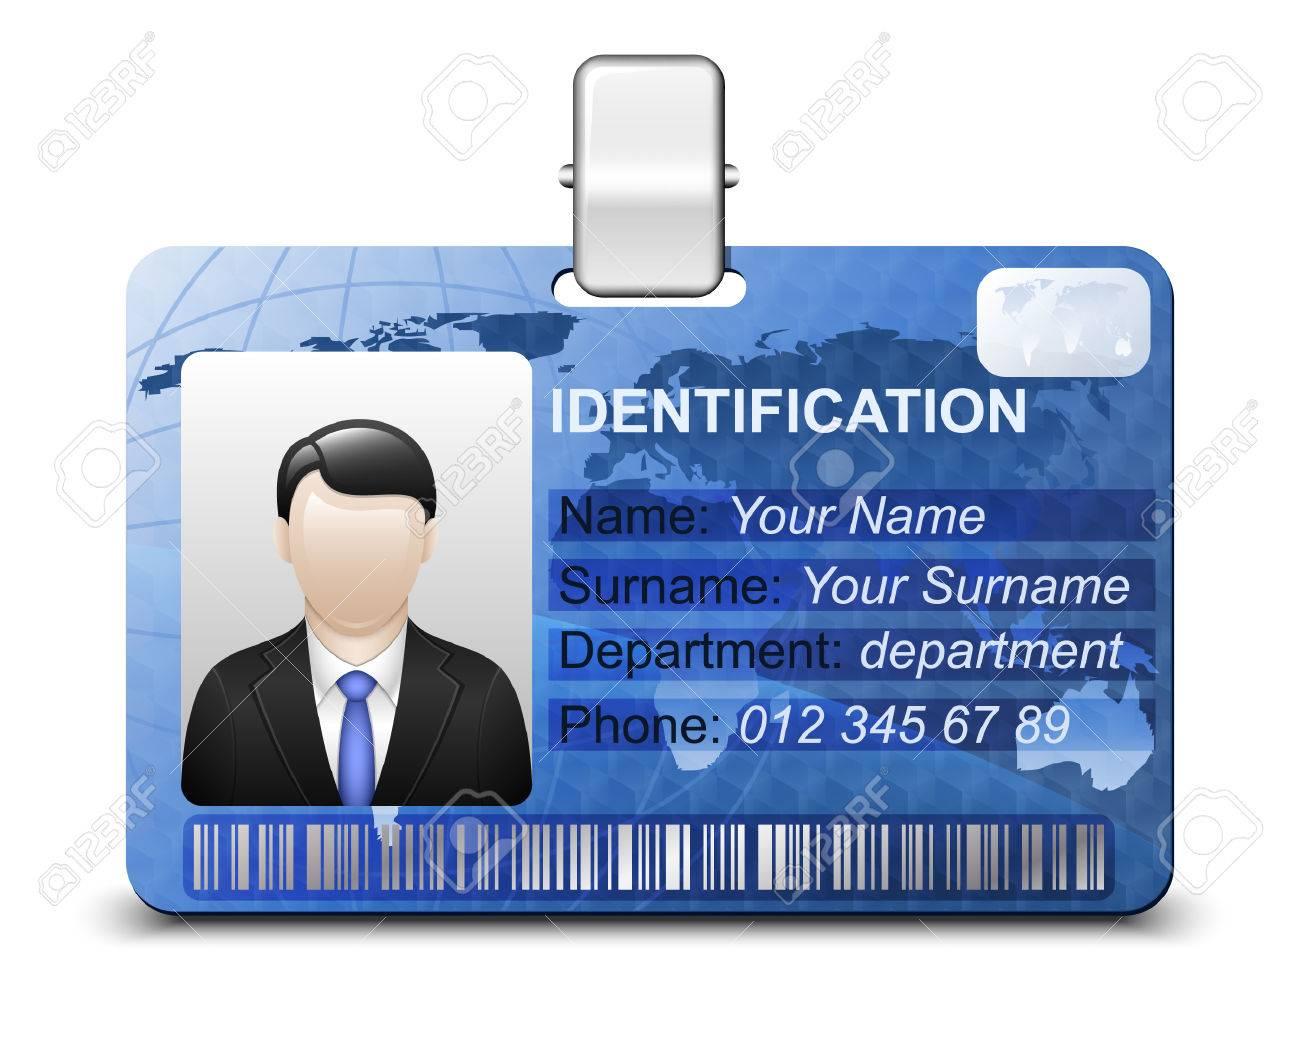 Identification card icon. Vector illustration - 41966902